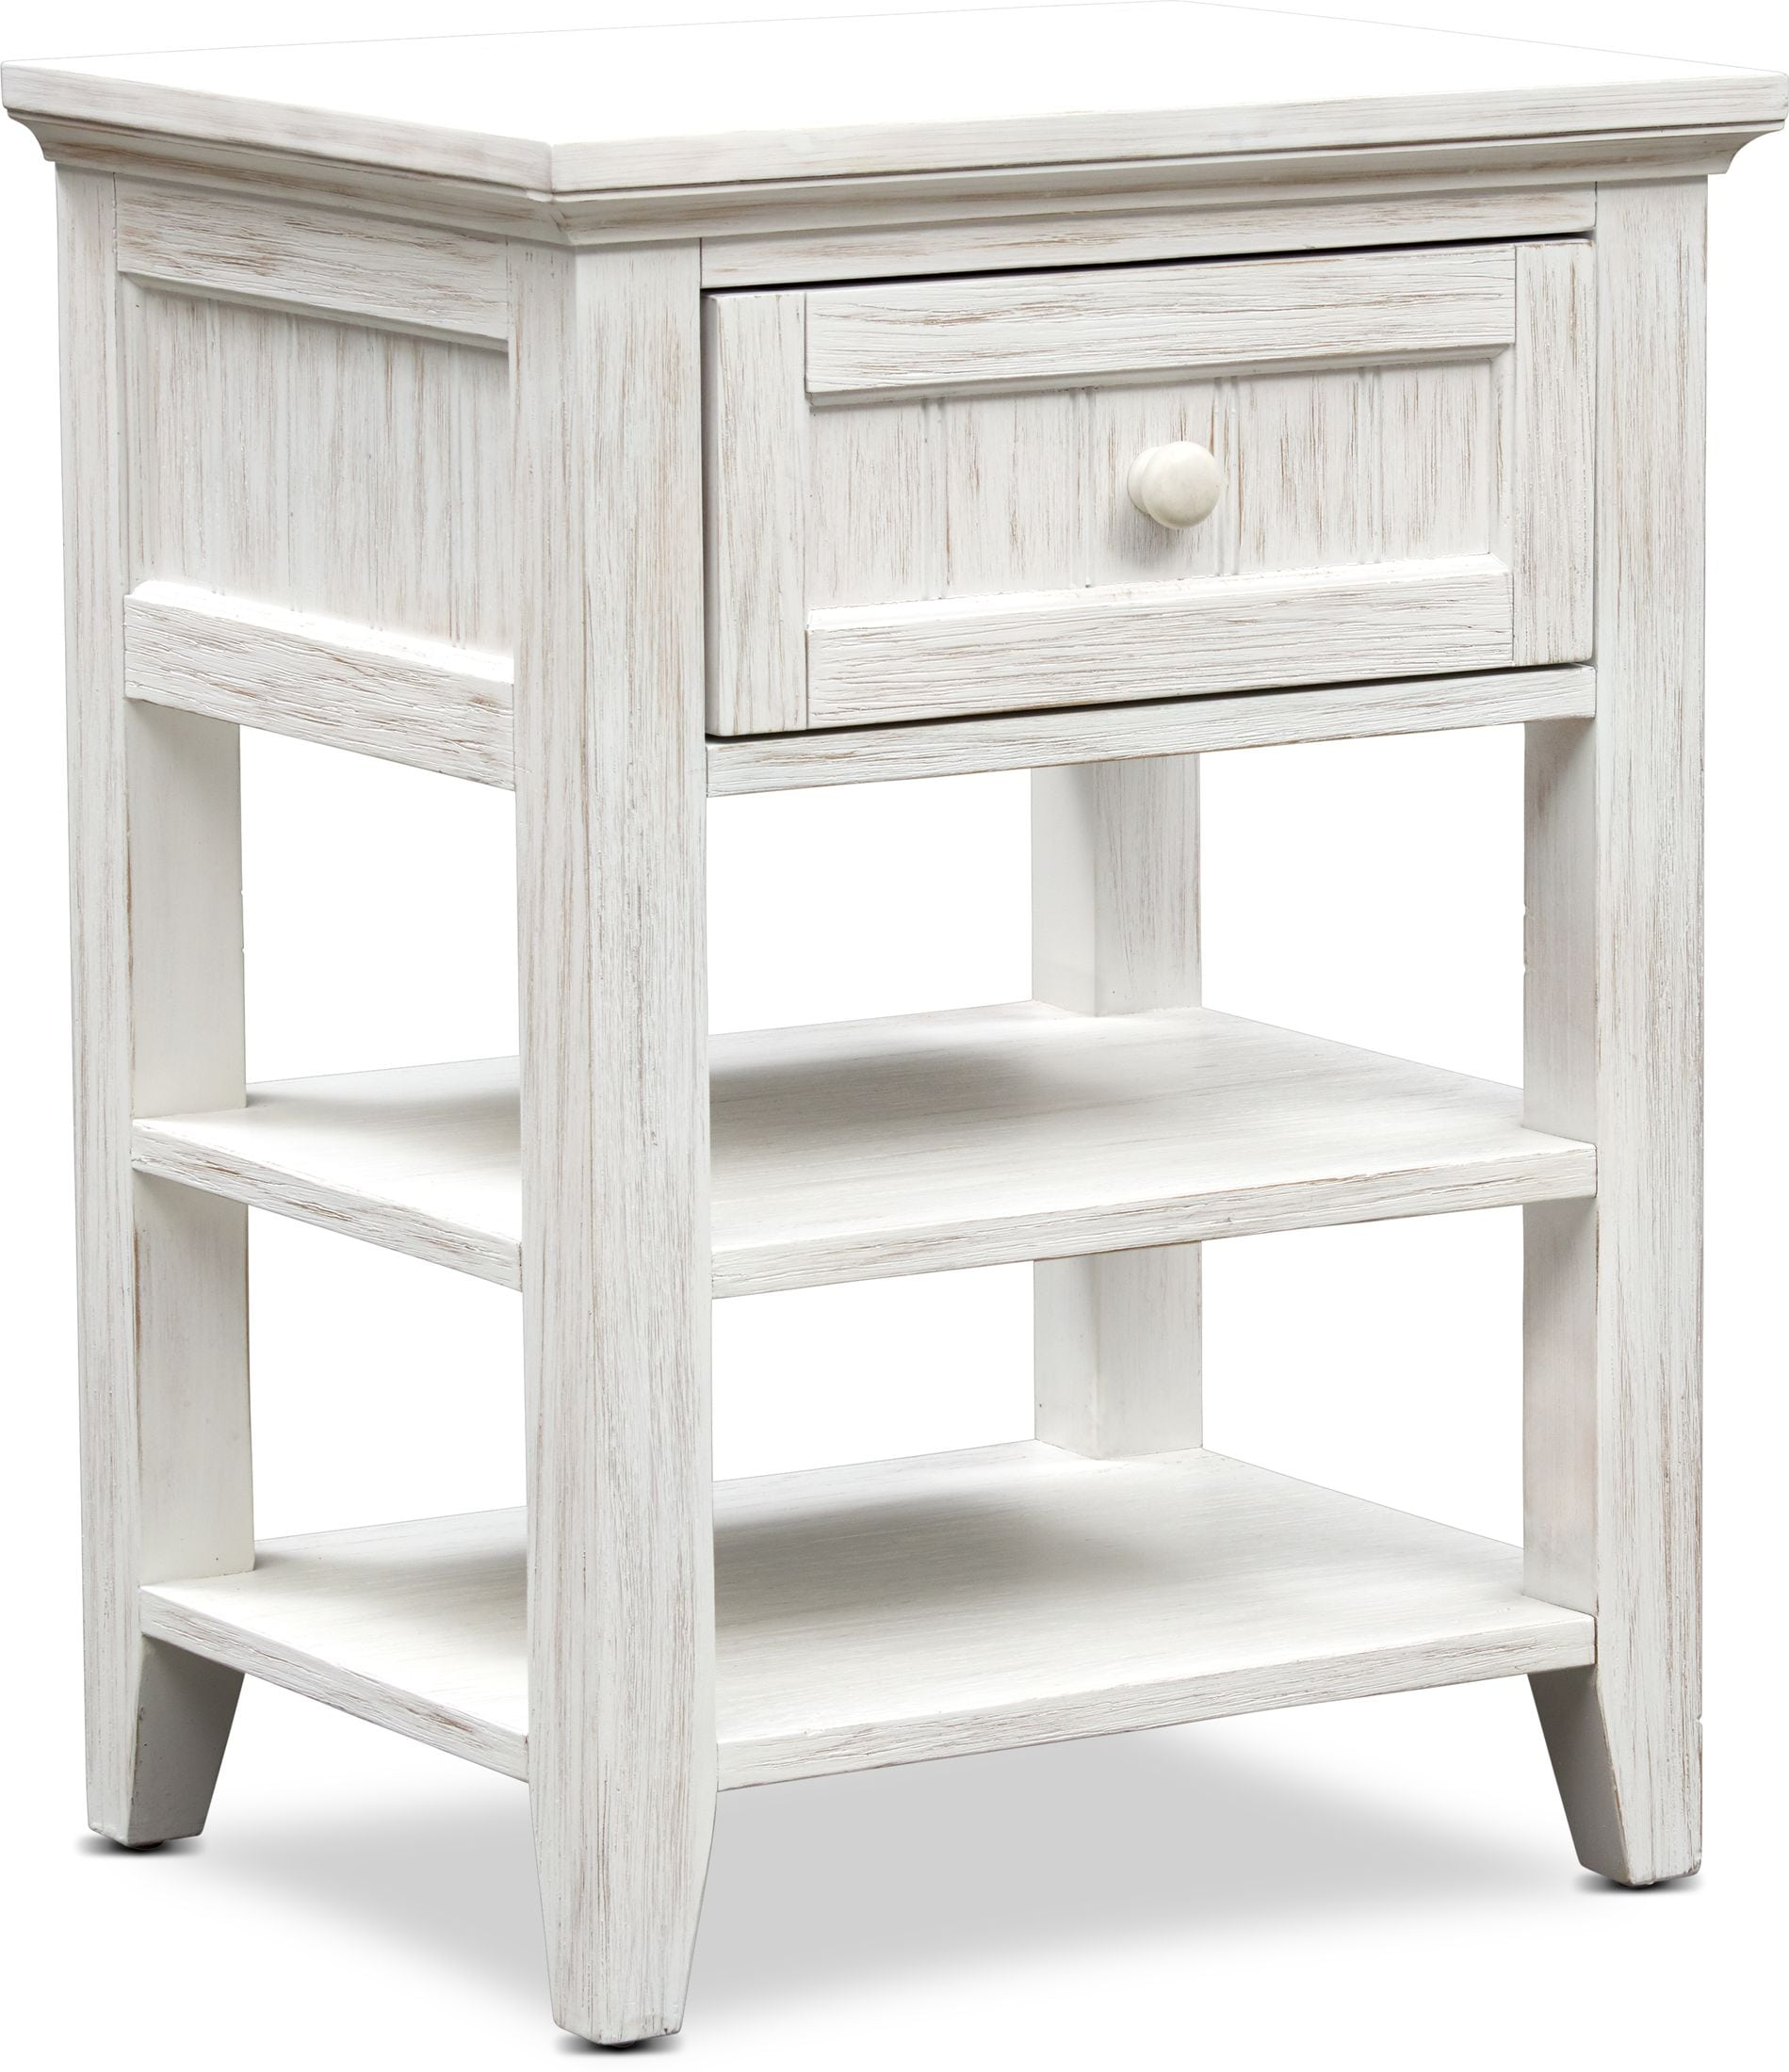 Kids Furniture - Sidney Nightstand